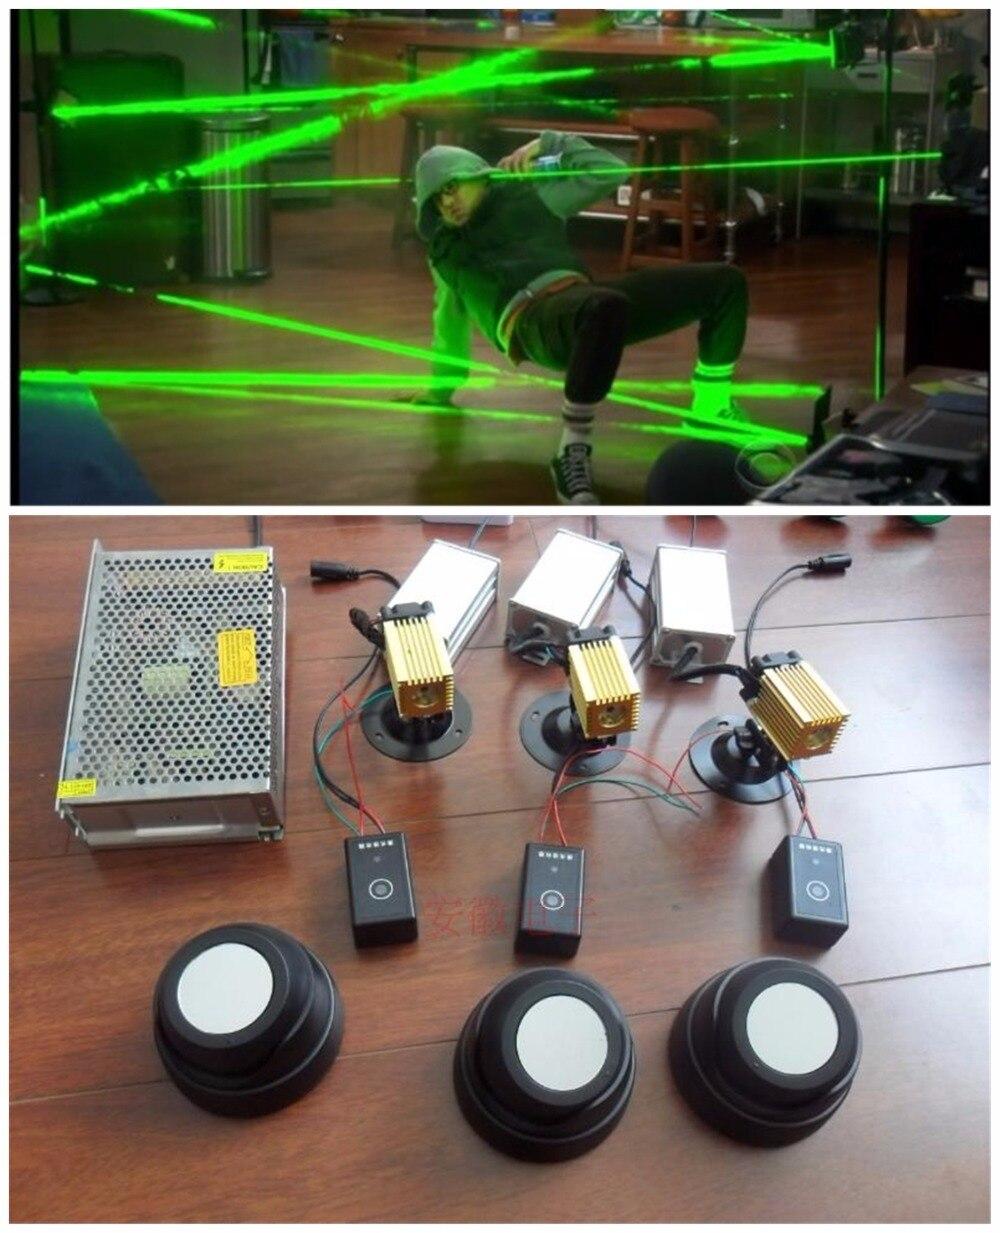 Hotsale diseño magia penetralium escape apoyos sala de vida Real láser verde array cámara de escape secreto juego